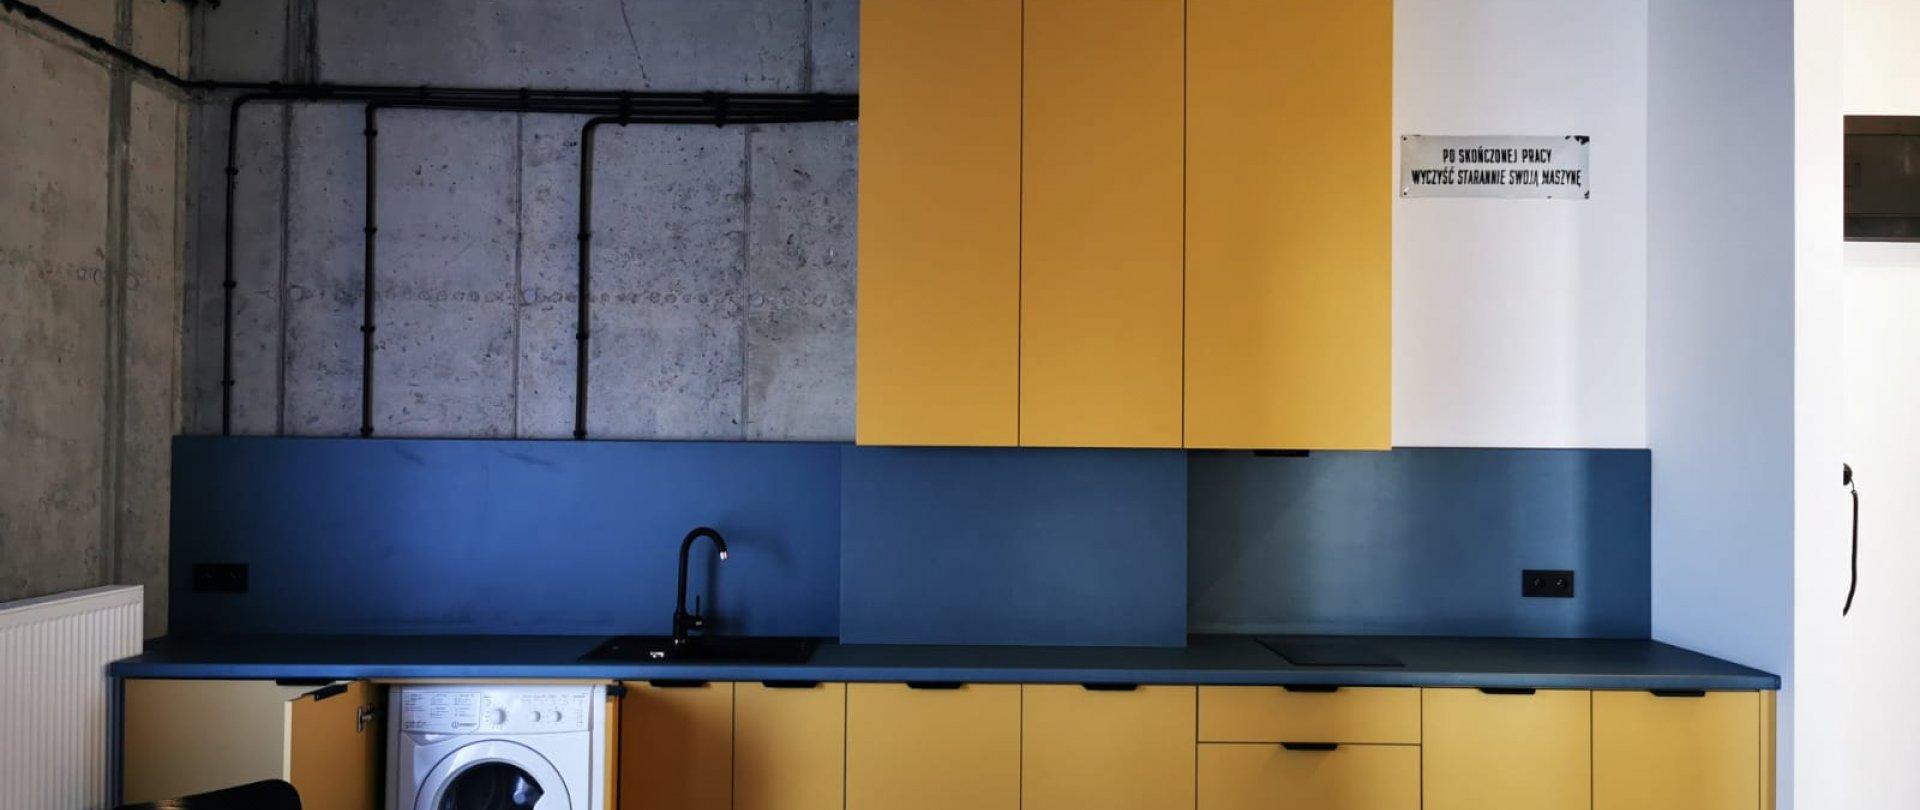 Apartament z aneksem kuchennym w Fabryce II